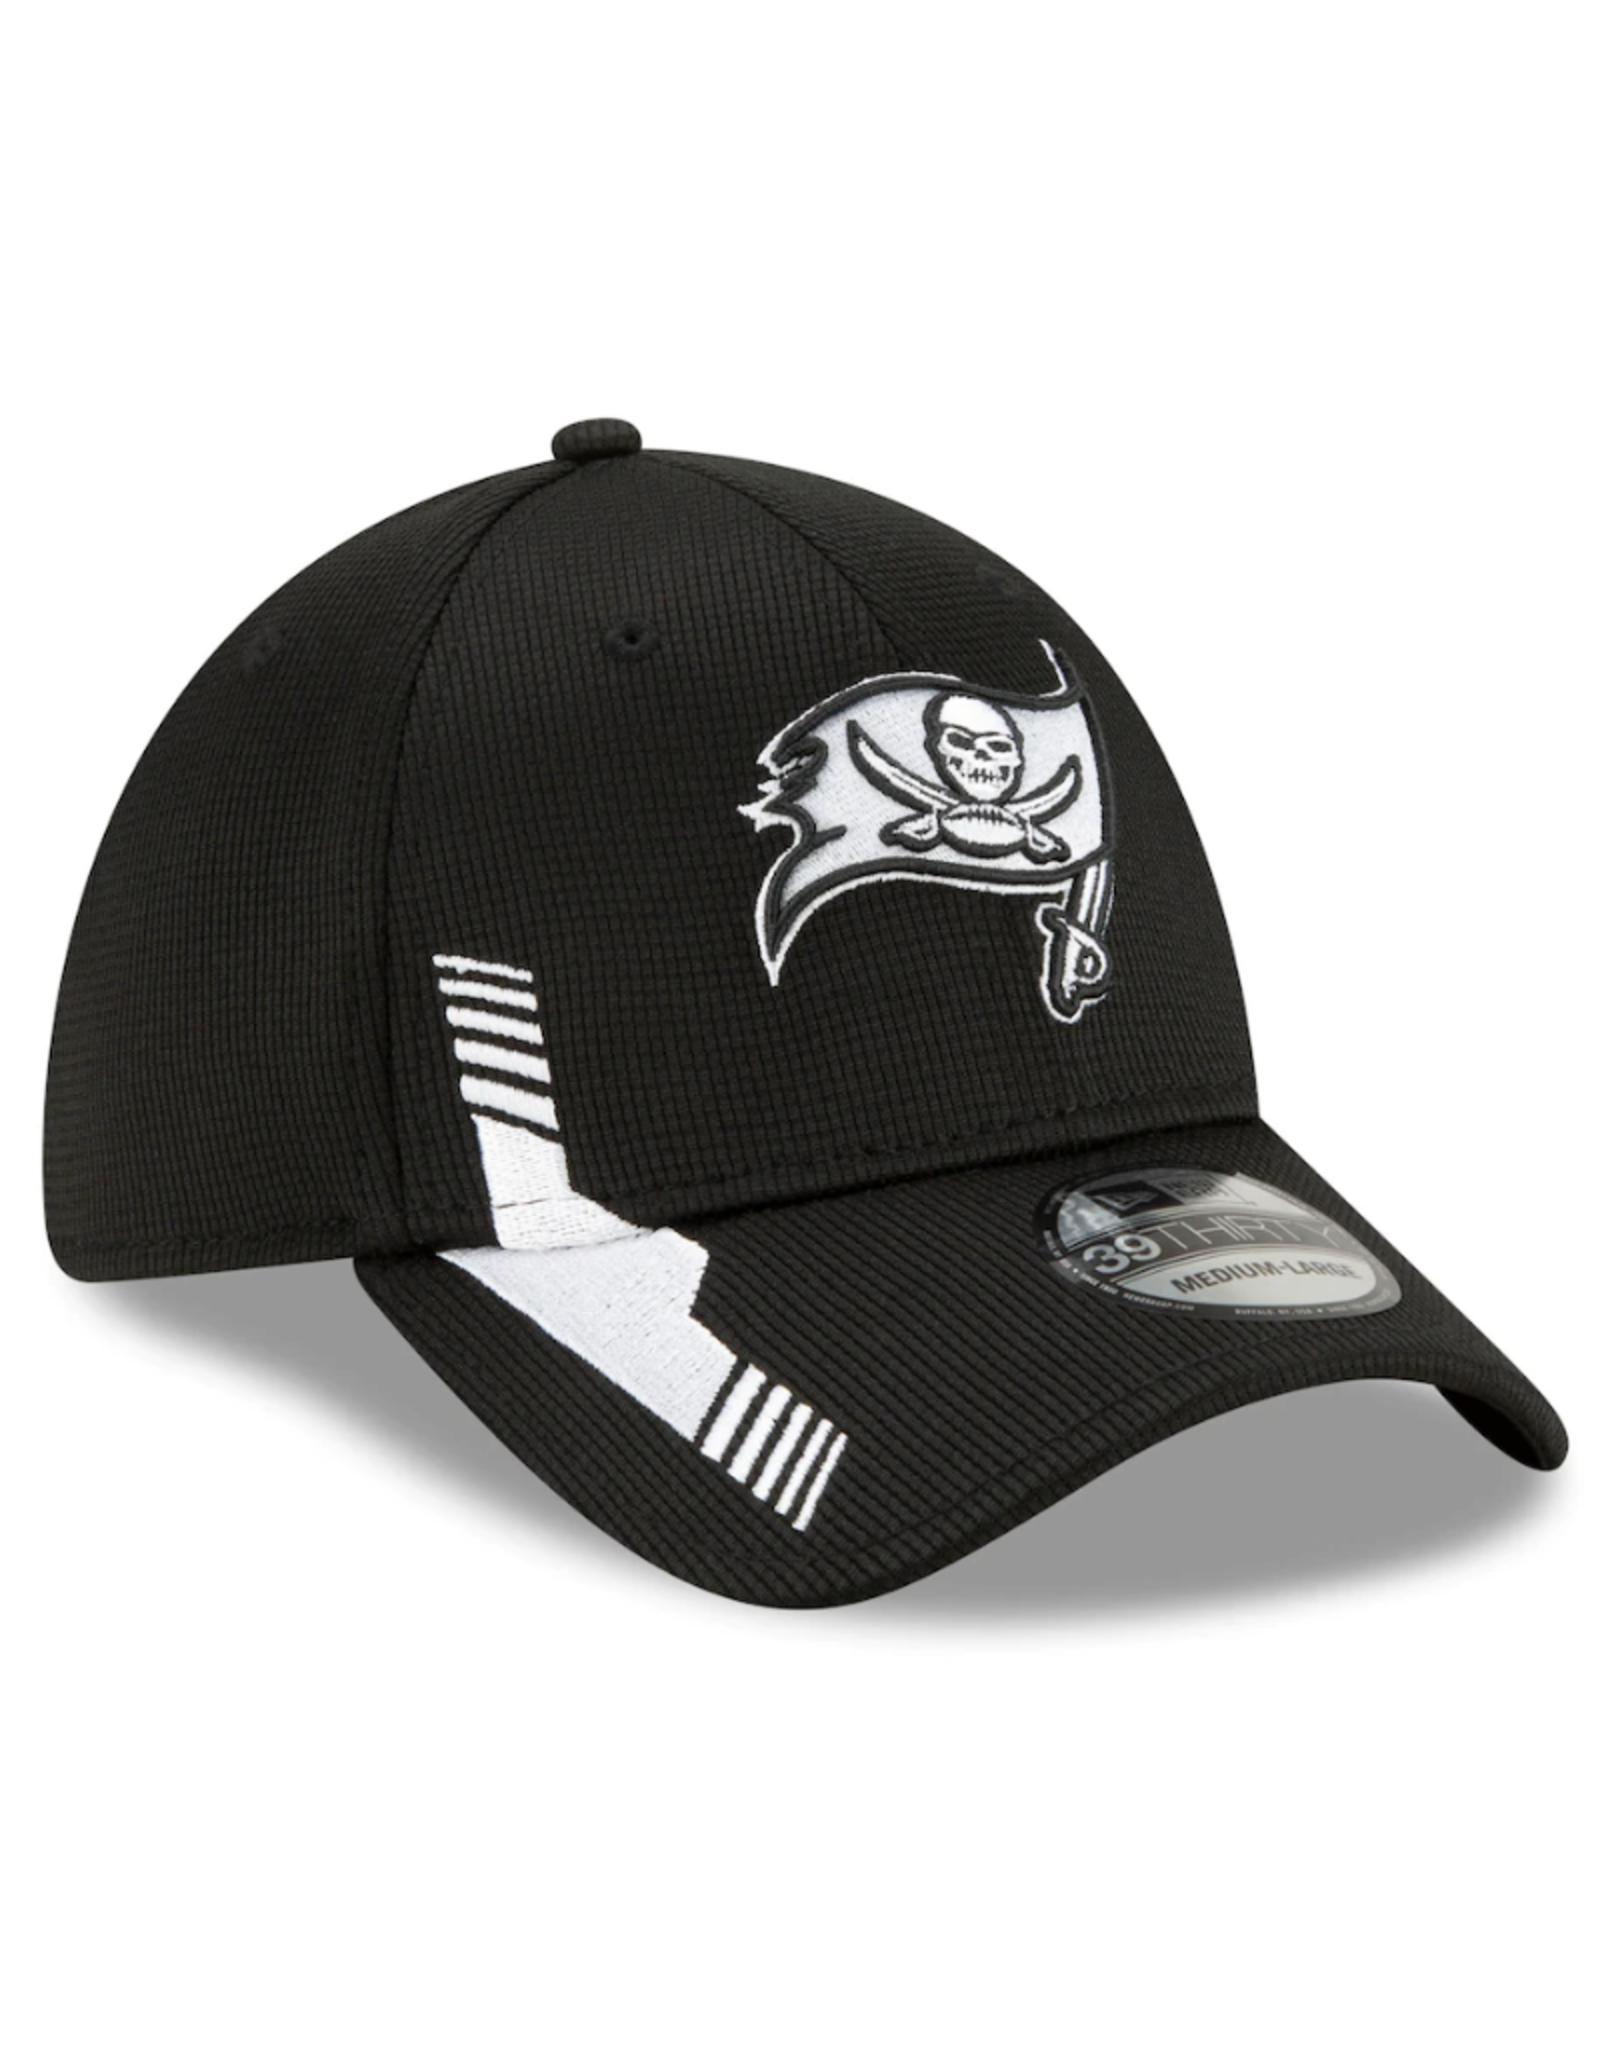 New Era Men's '21 39THIRTY Sideline Home Hat Tampa Bay Buccaneers Black/White